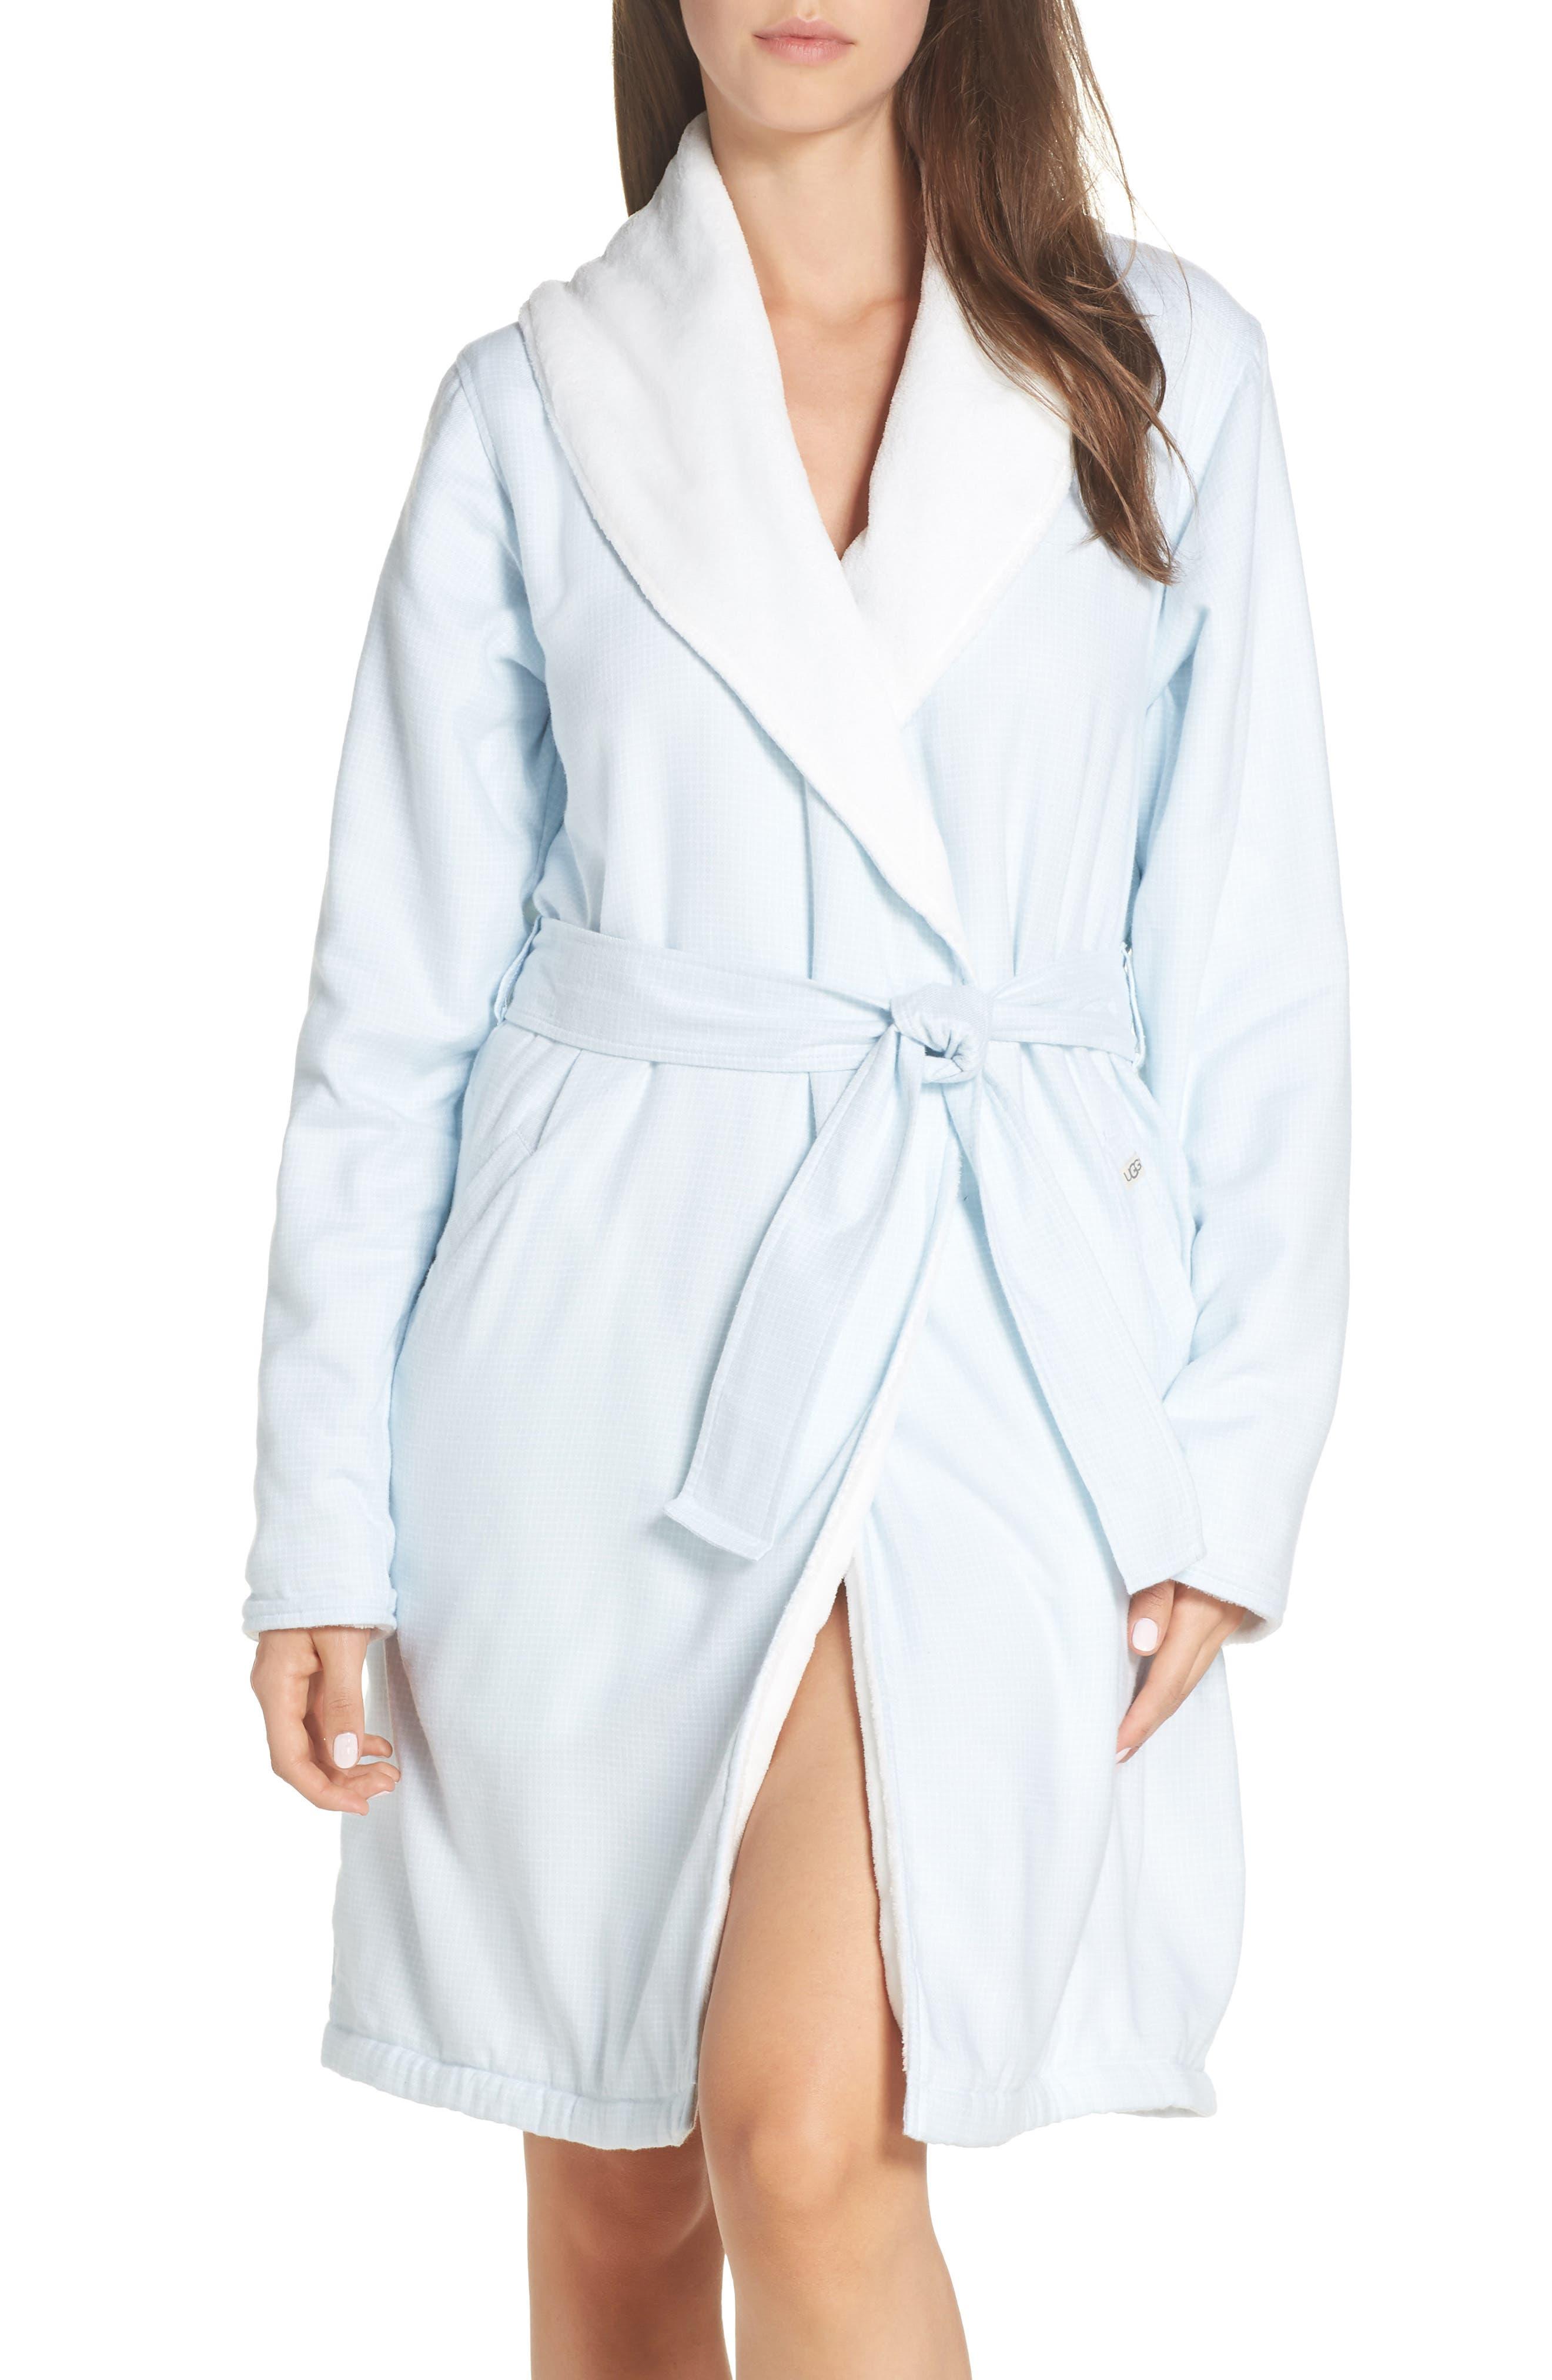 Anika Fleece Lined Flannel Robe,                             Main thumbnail 1, color,                             SKY BLUE / WHITE CHECK